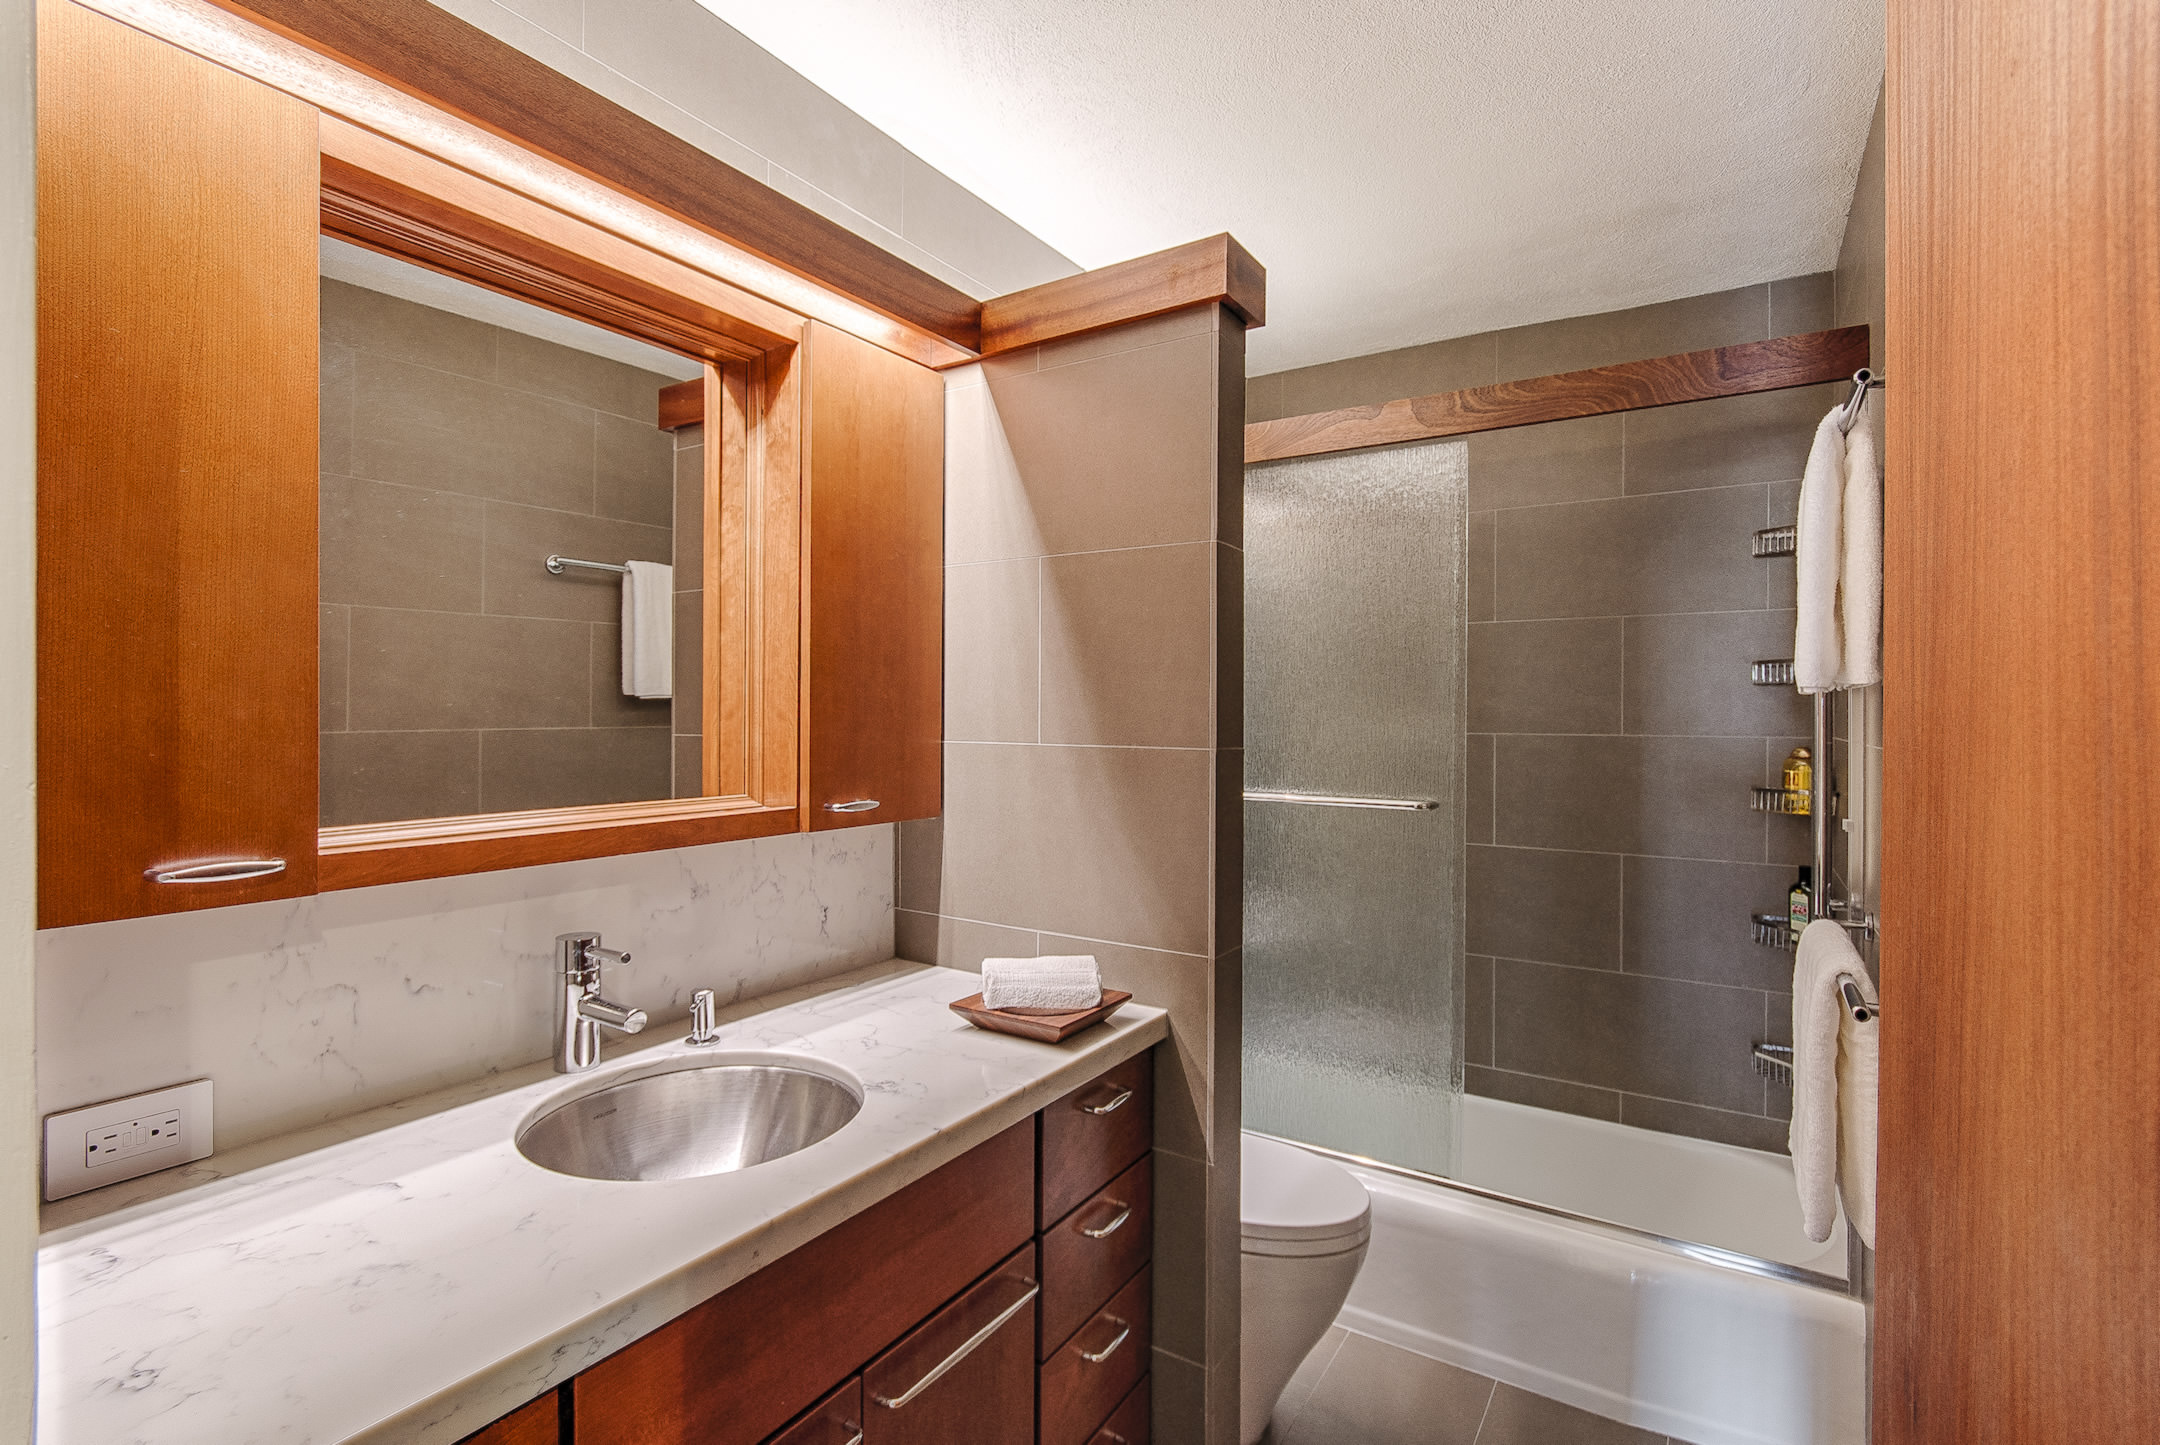 Downtown honolulu apartment renovation marshall design for Bath remodel honolulu